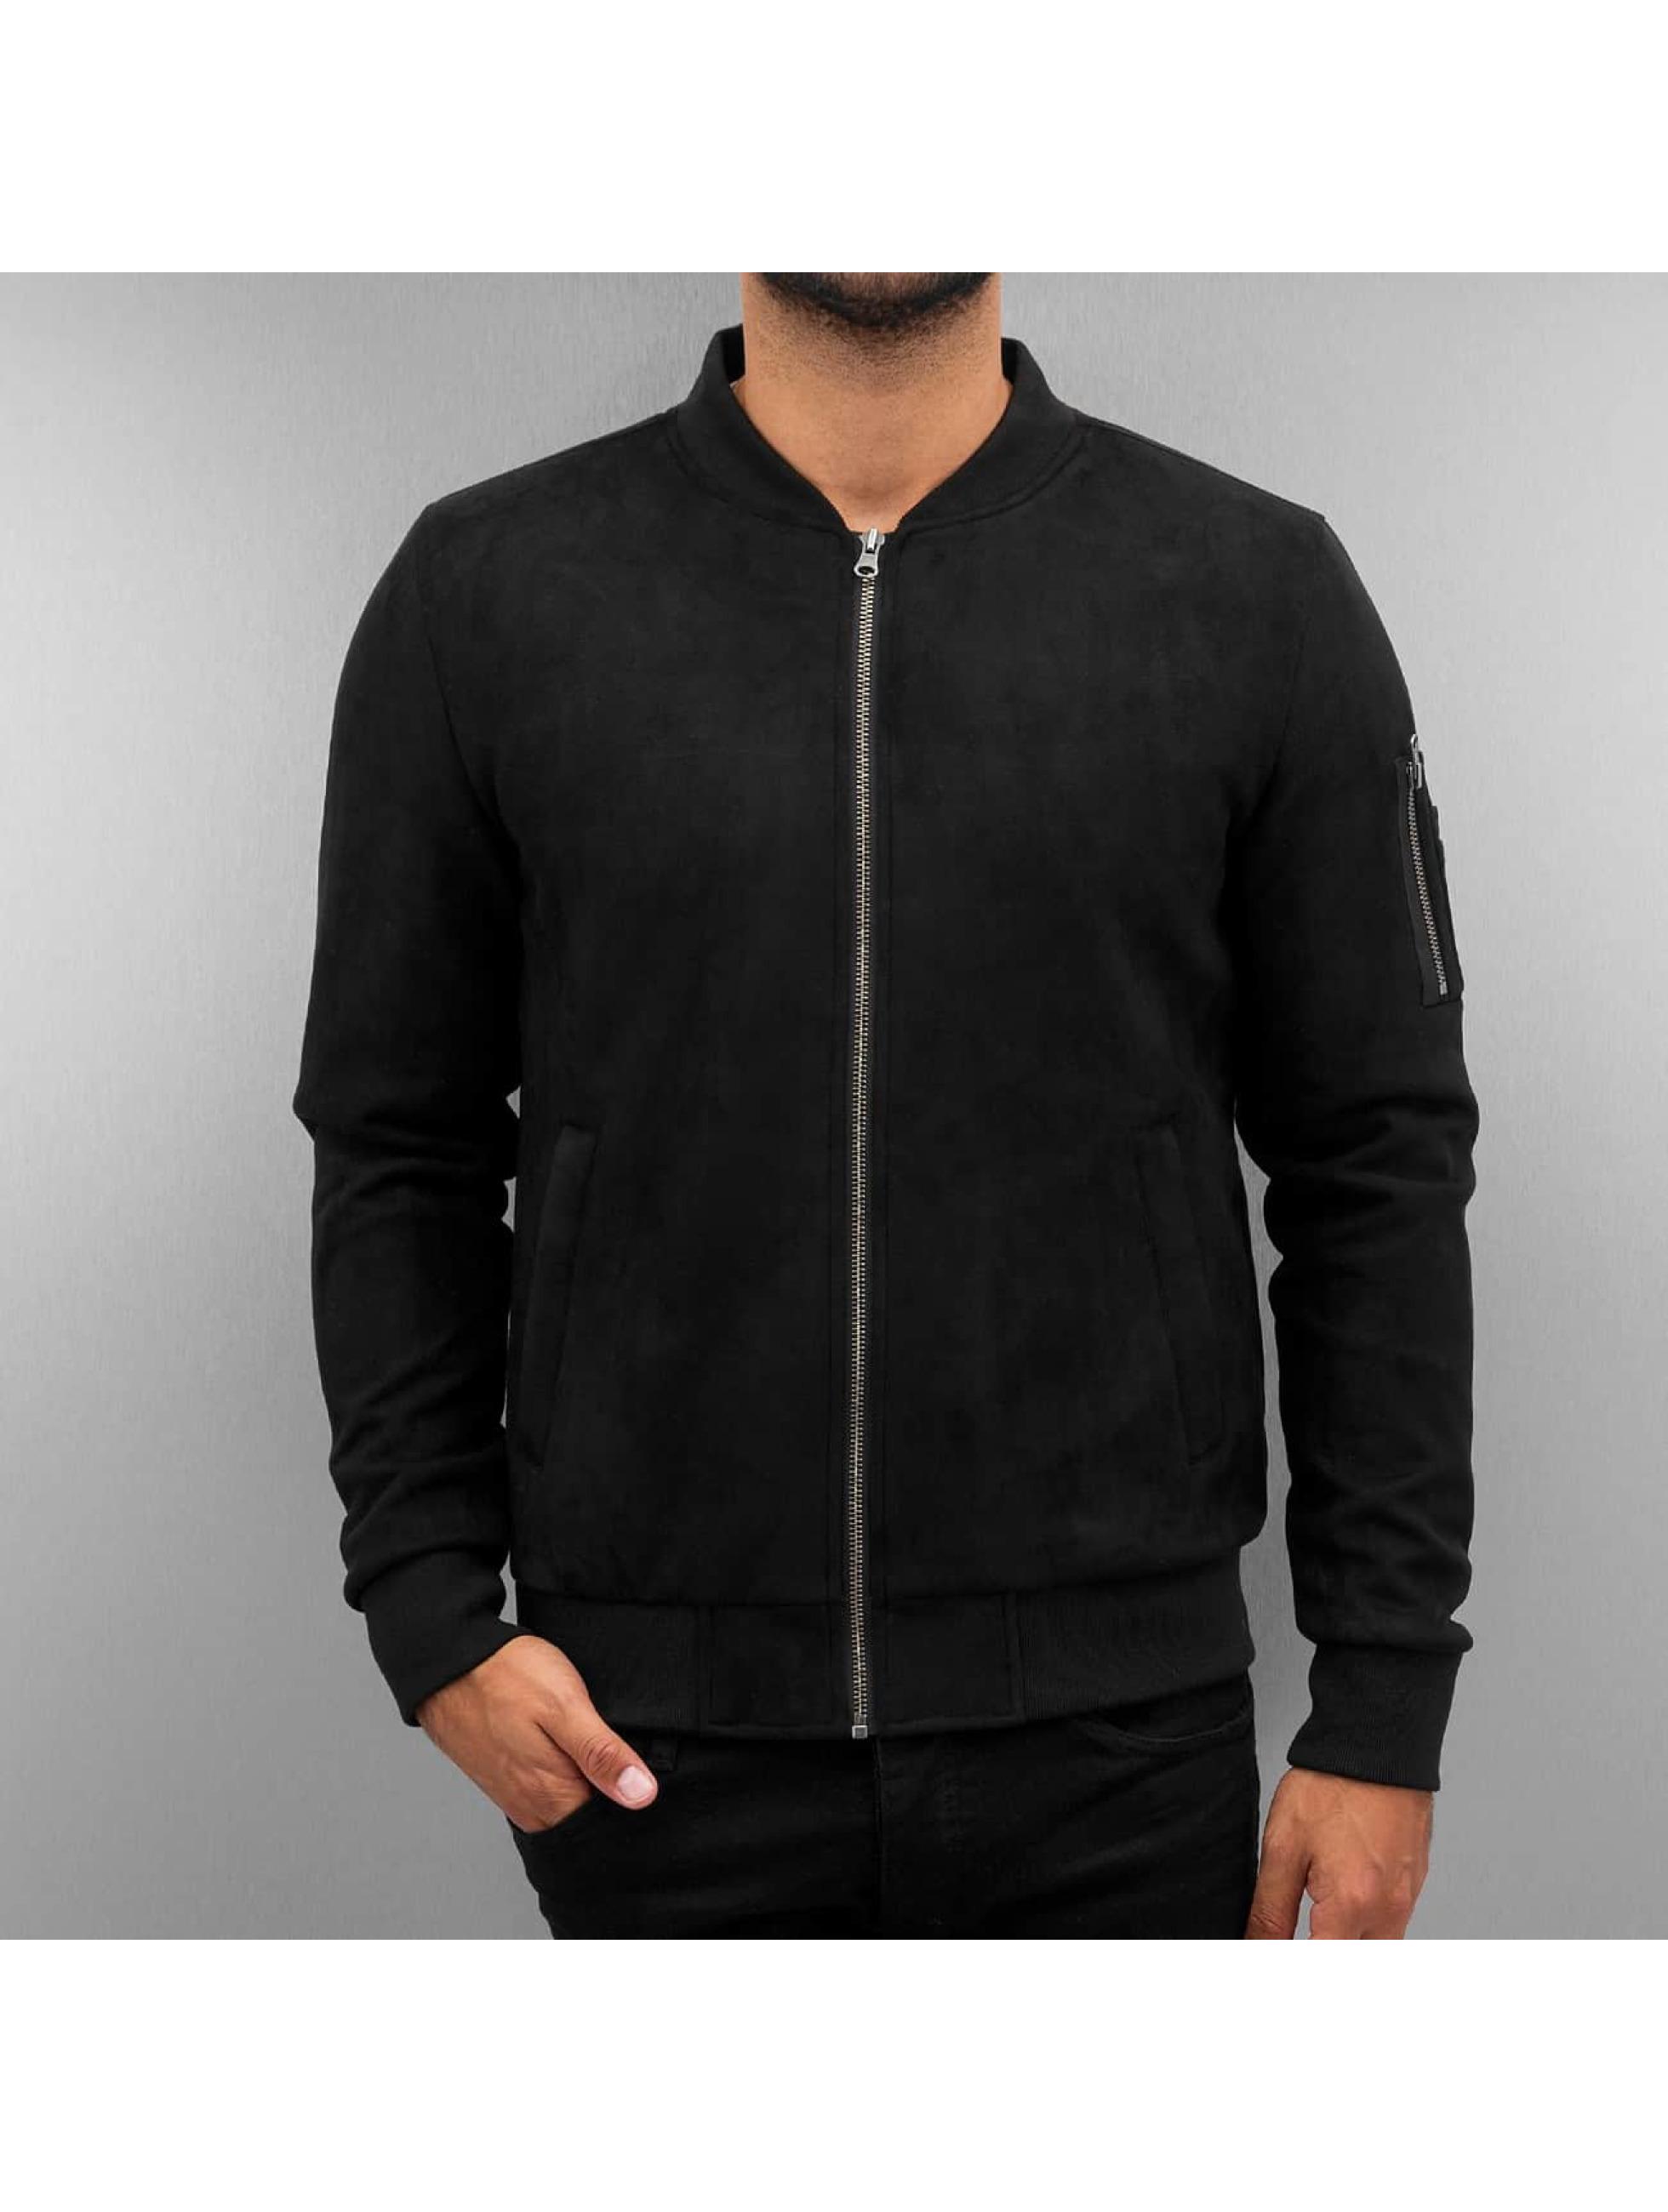 Urban Classics Lightweight Jacket Imitation Suede black